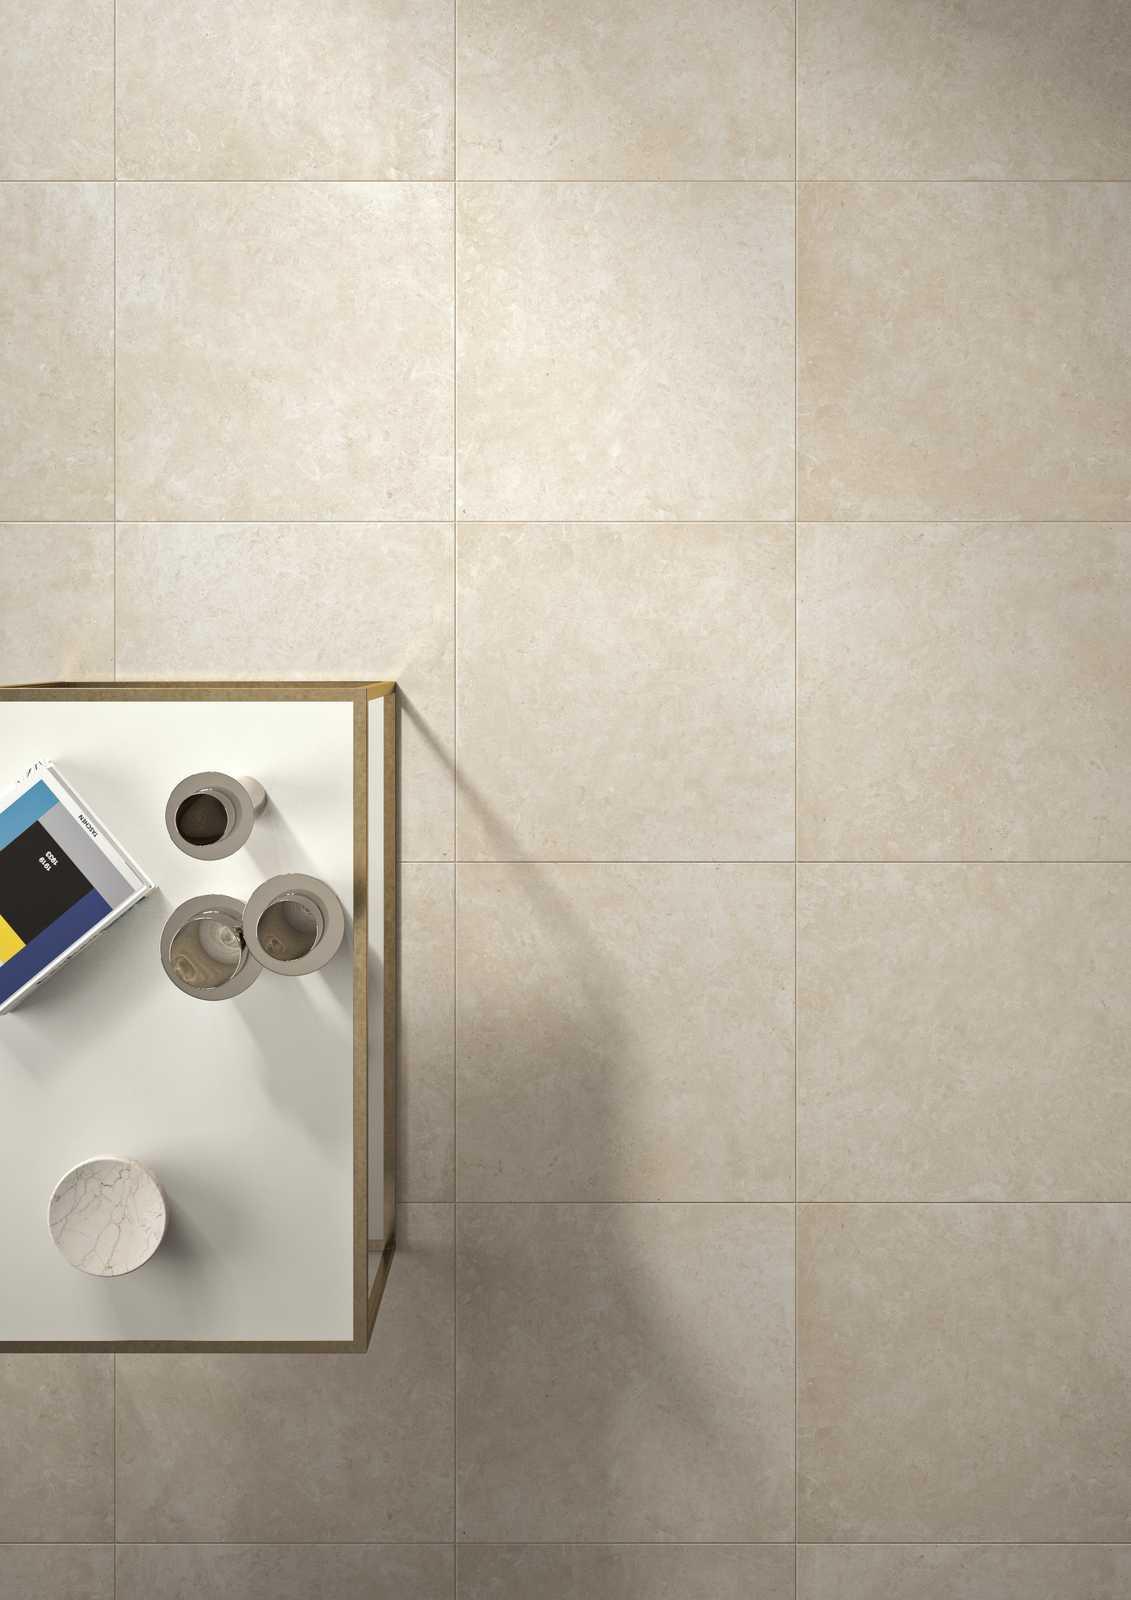 Pietra di noto porcelain stoneware flooring marazzi pietra di noto ceramic tiles marazzi4230 dailygadgetfo Choice Image